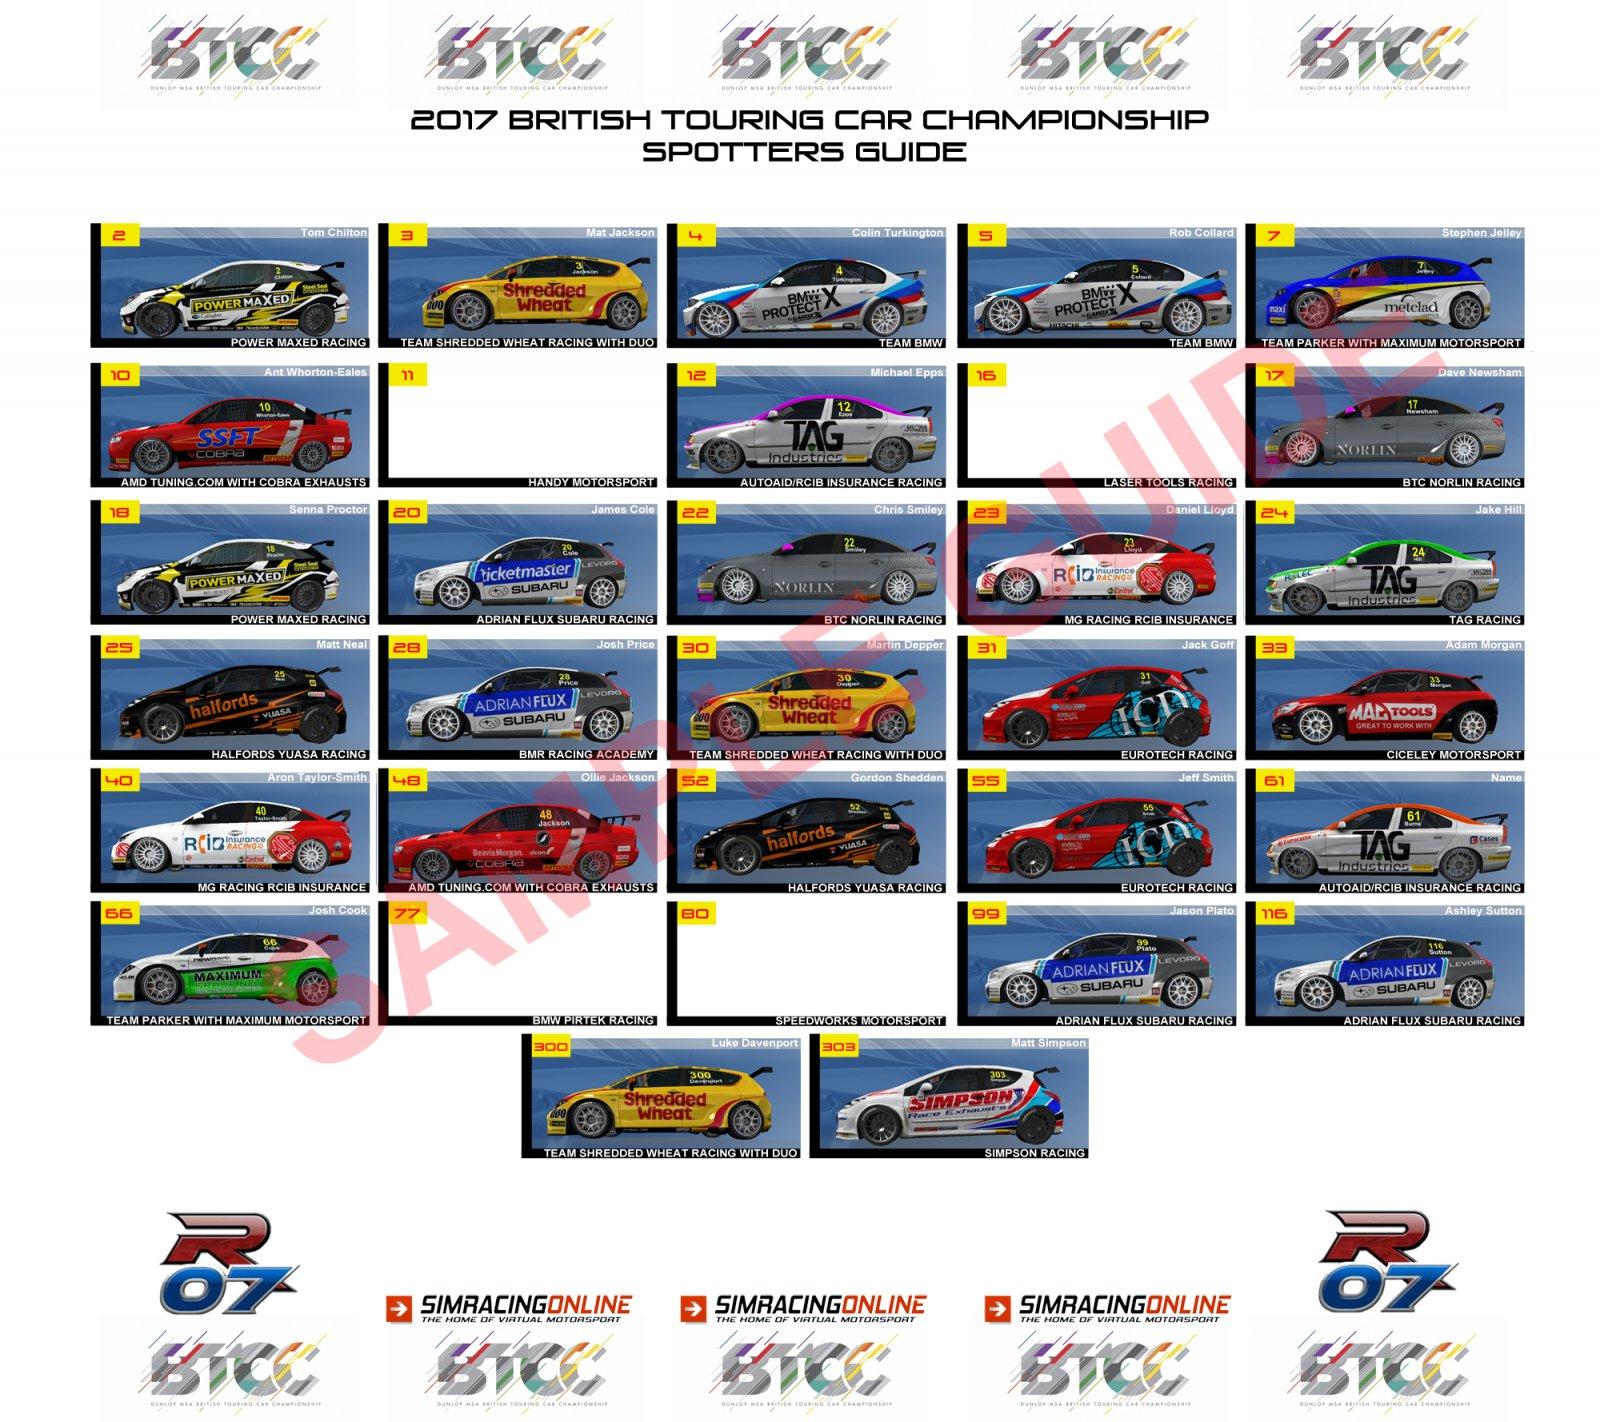 Spotters Guide BTCC 2017.jpg